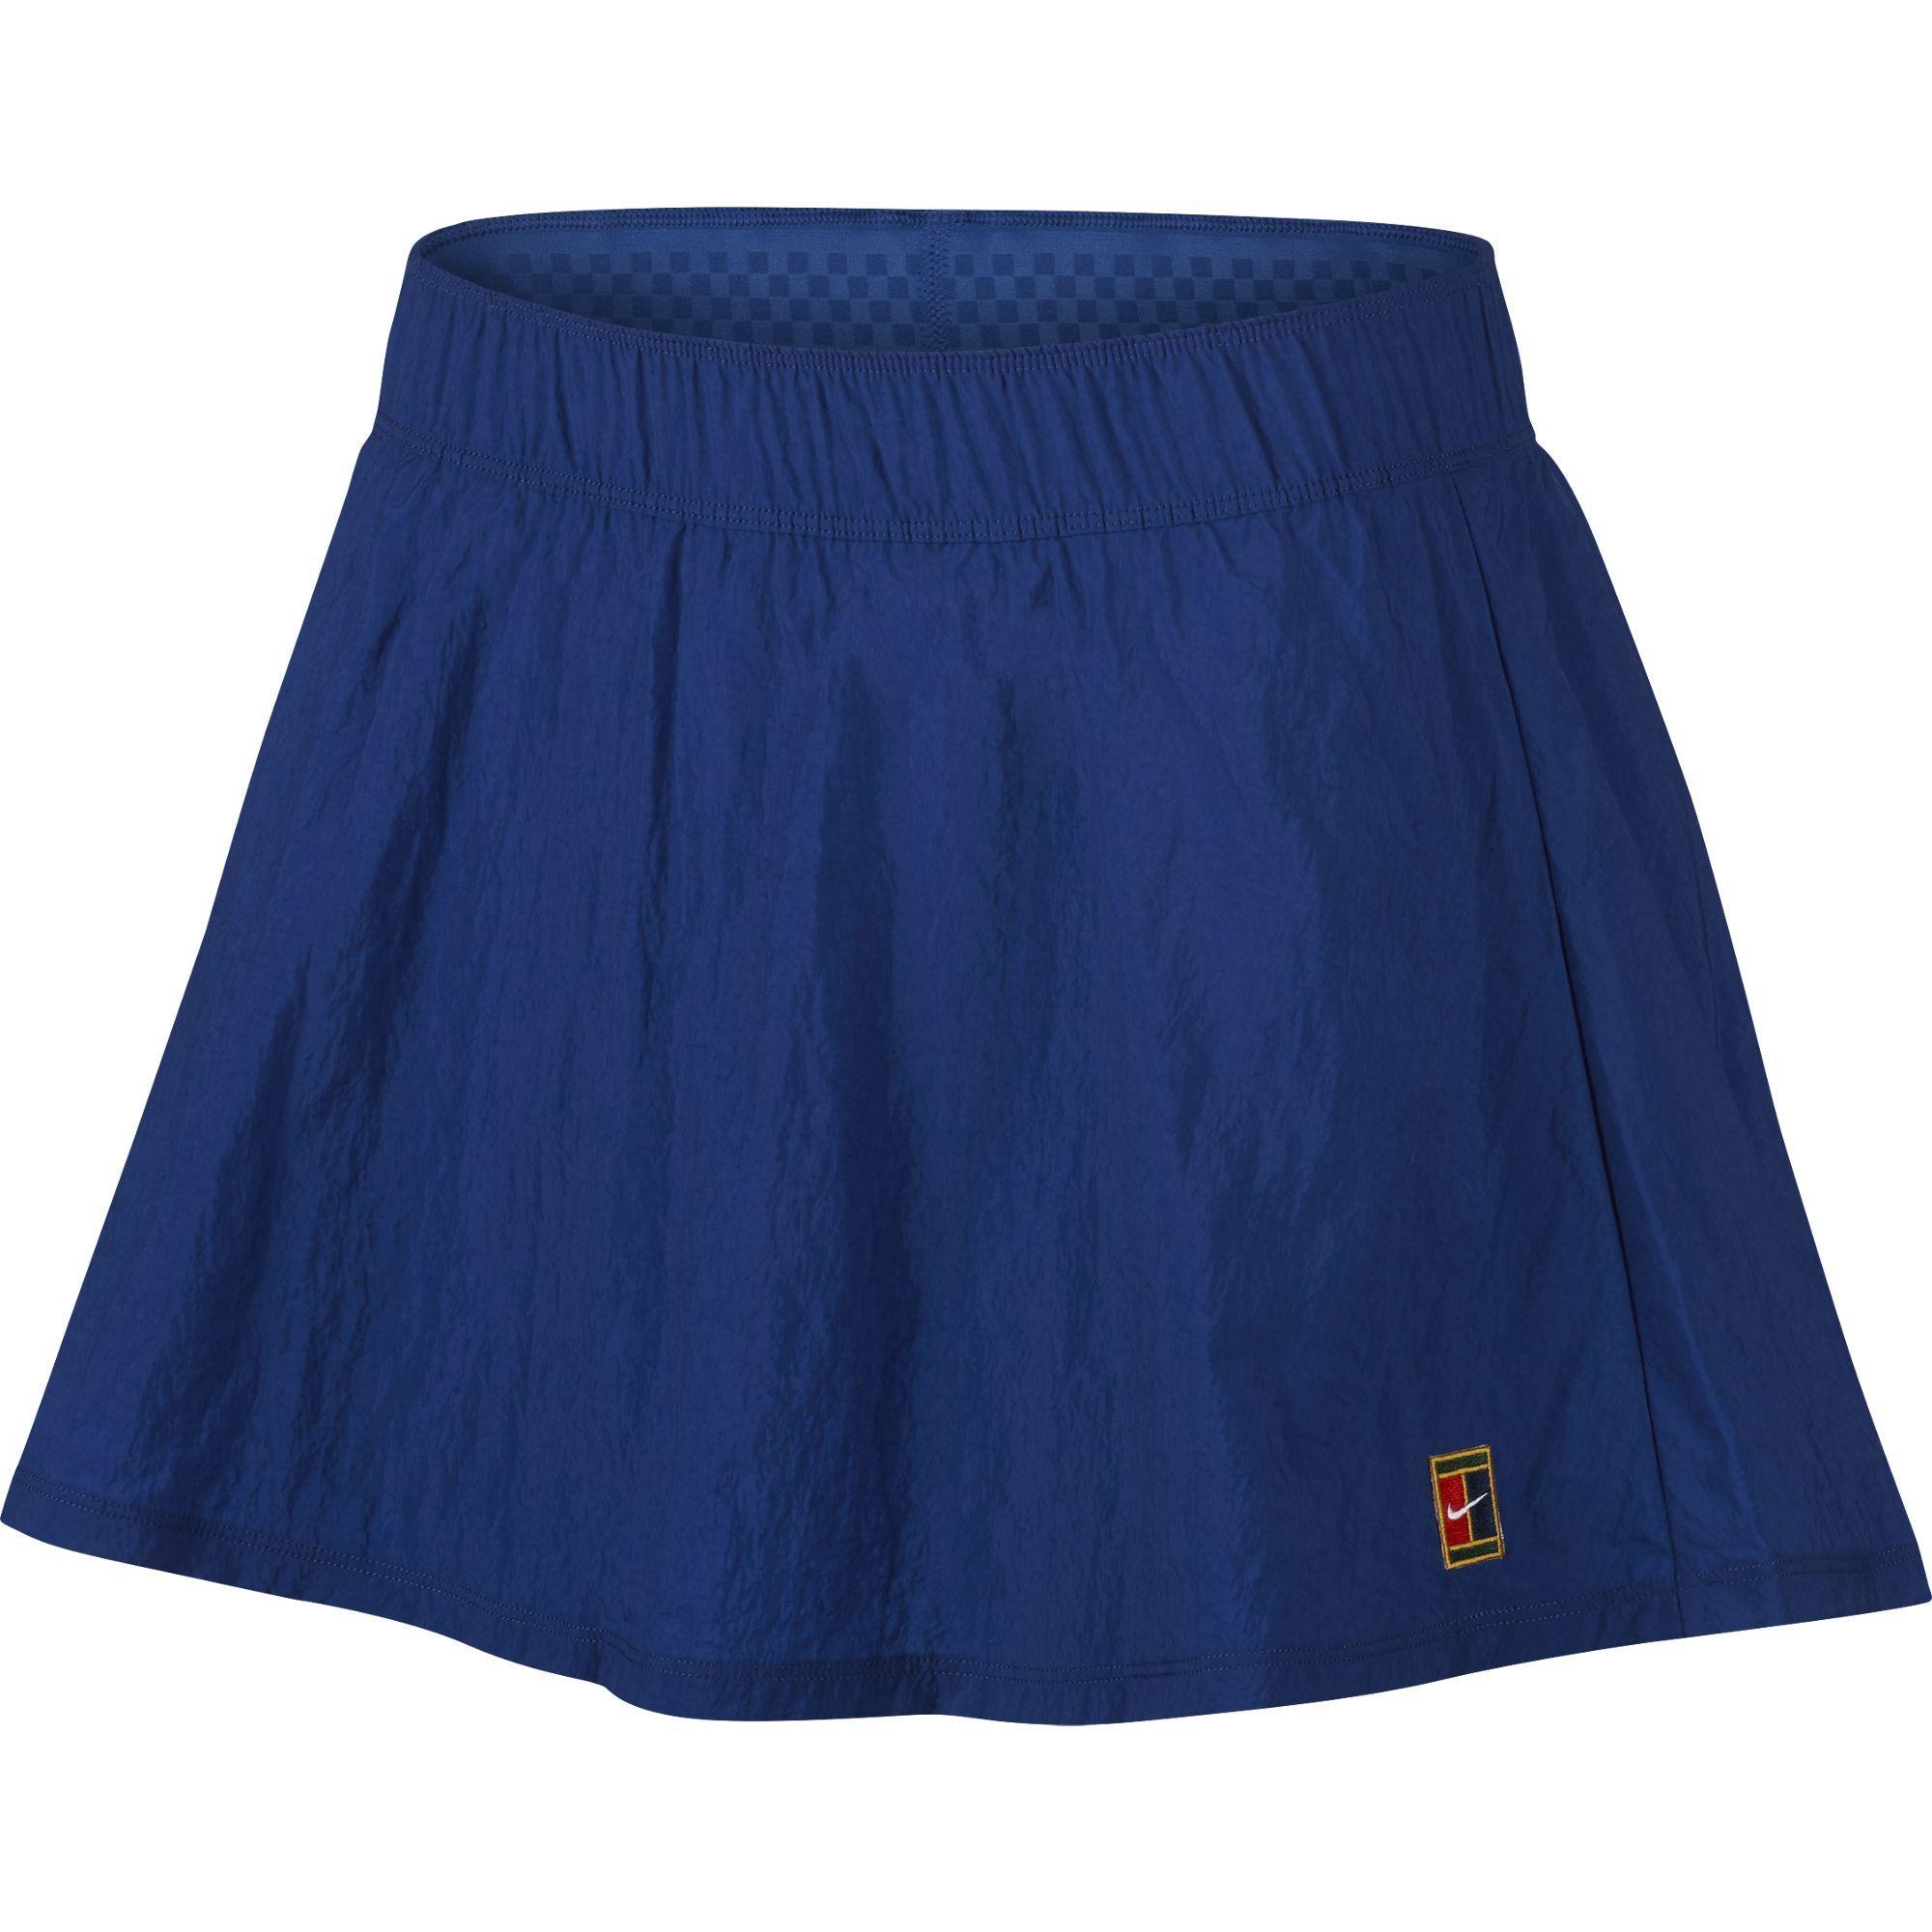 b450ece72 Nike Womens Flex Skort - Indigo Force - Tennisnuts.com